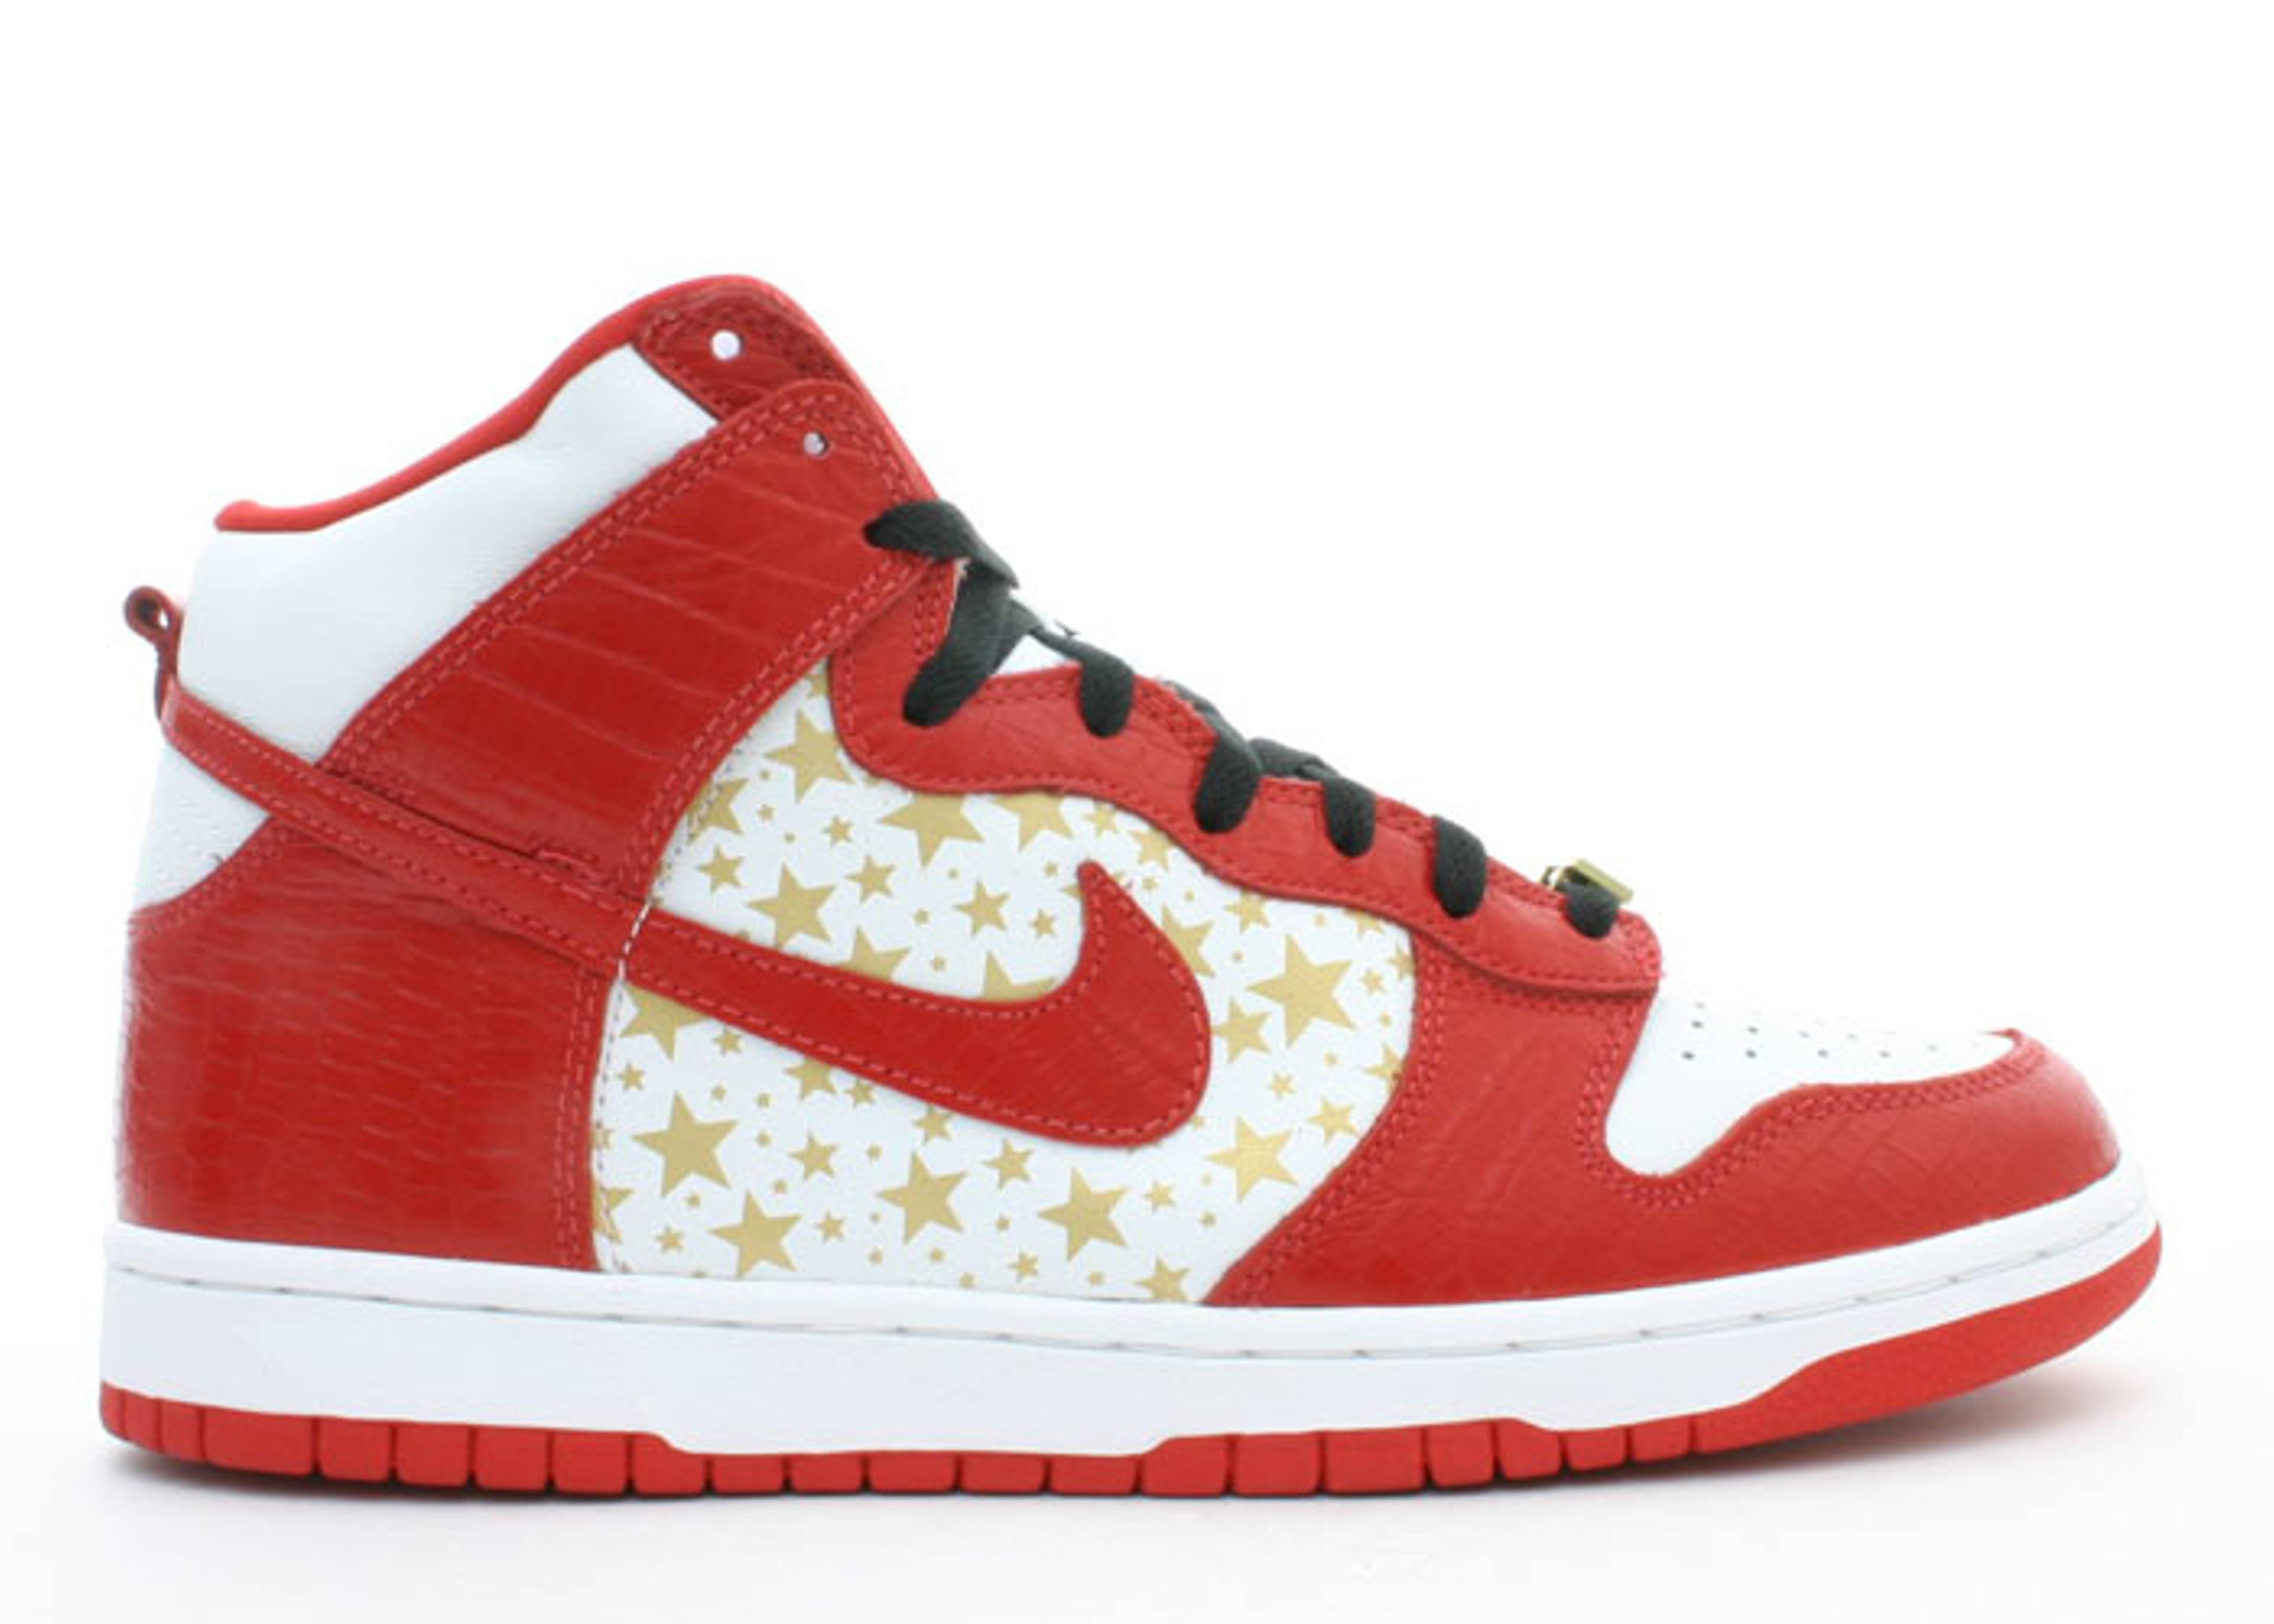 Supreme Shoes White Shoes